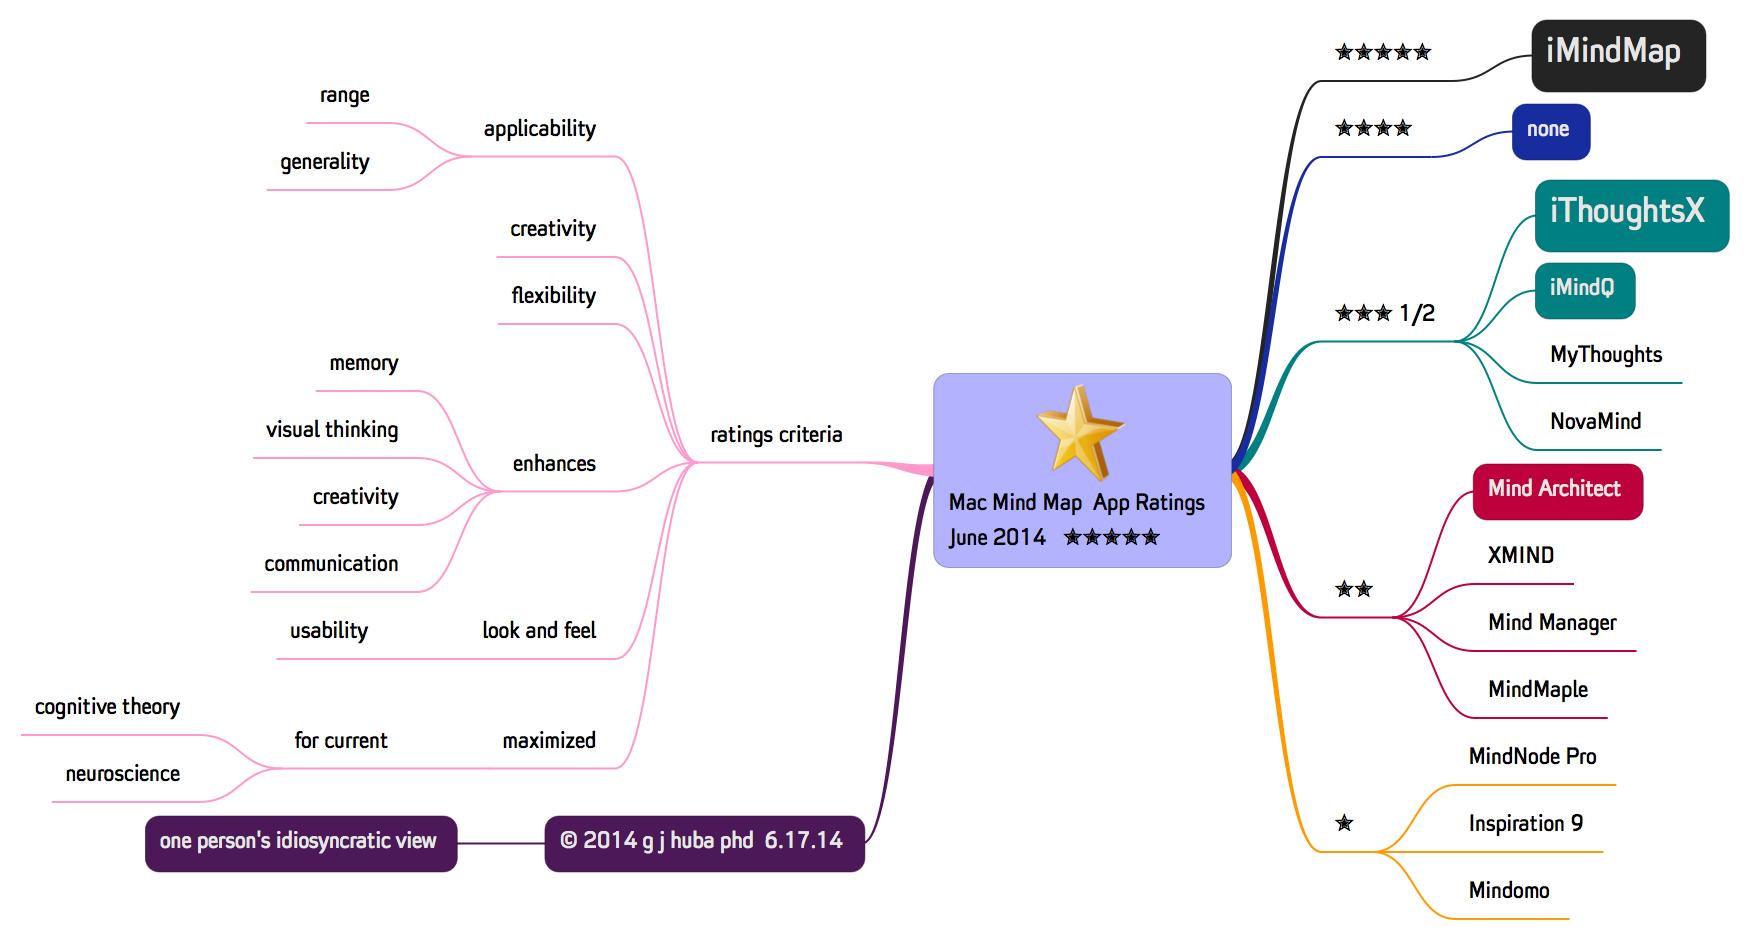 iThoughts Mac Mind Map  Program Ratings  June 2014  g j huba phd  ✮✮✮✮✮